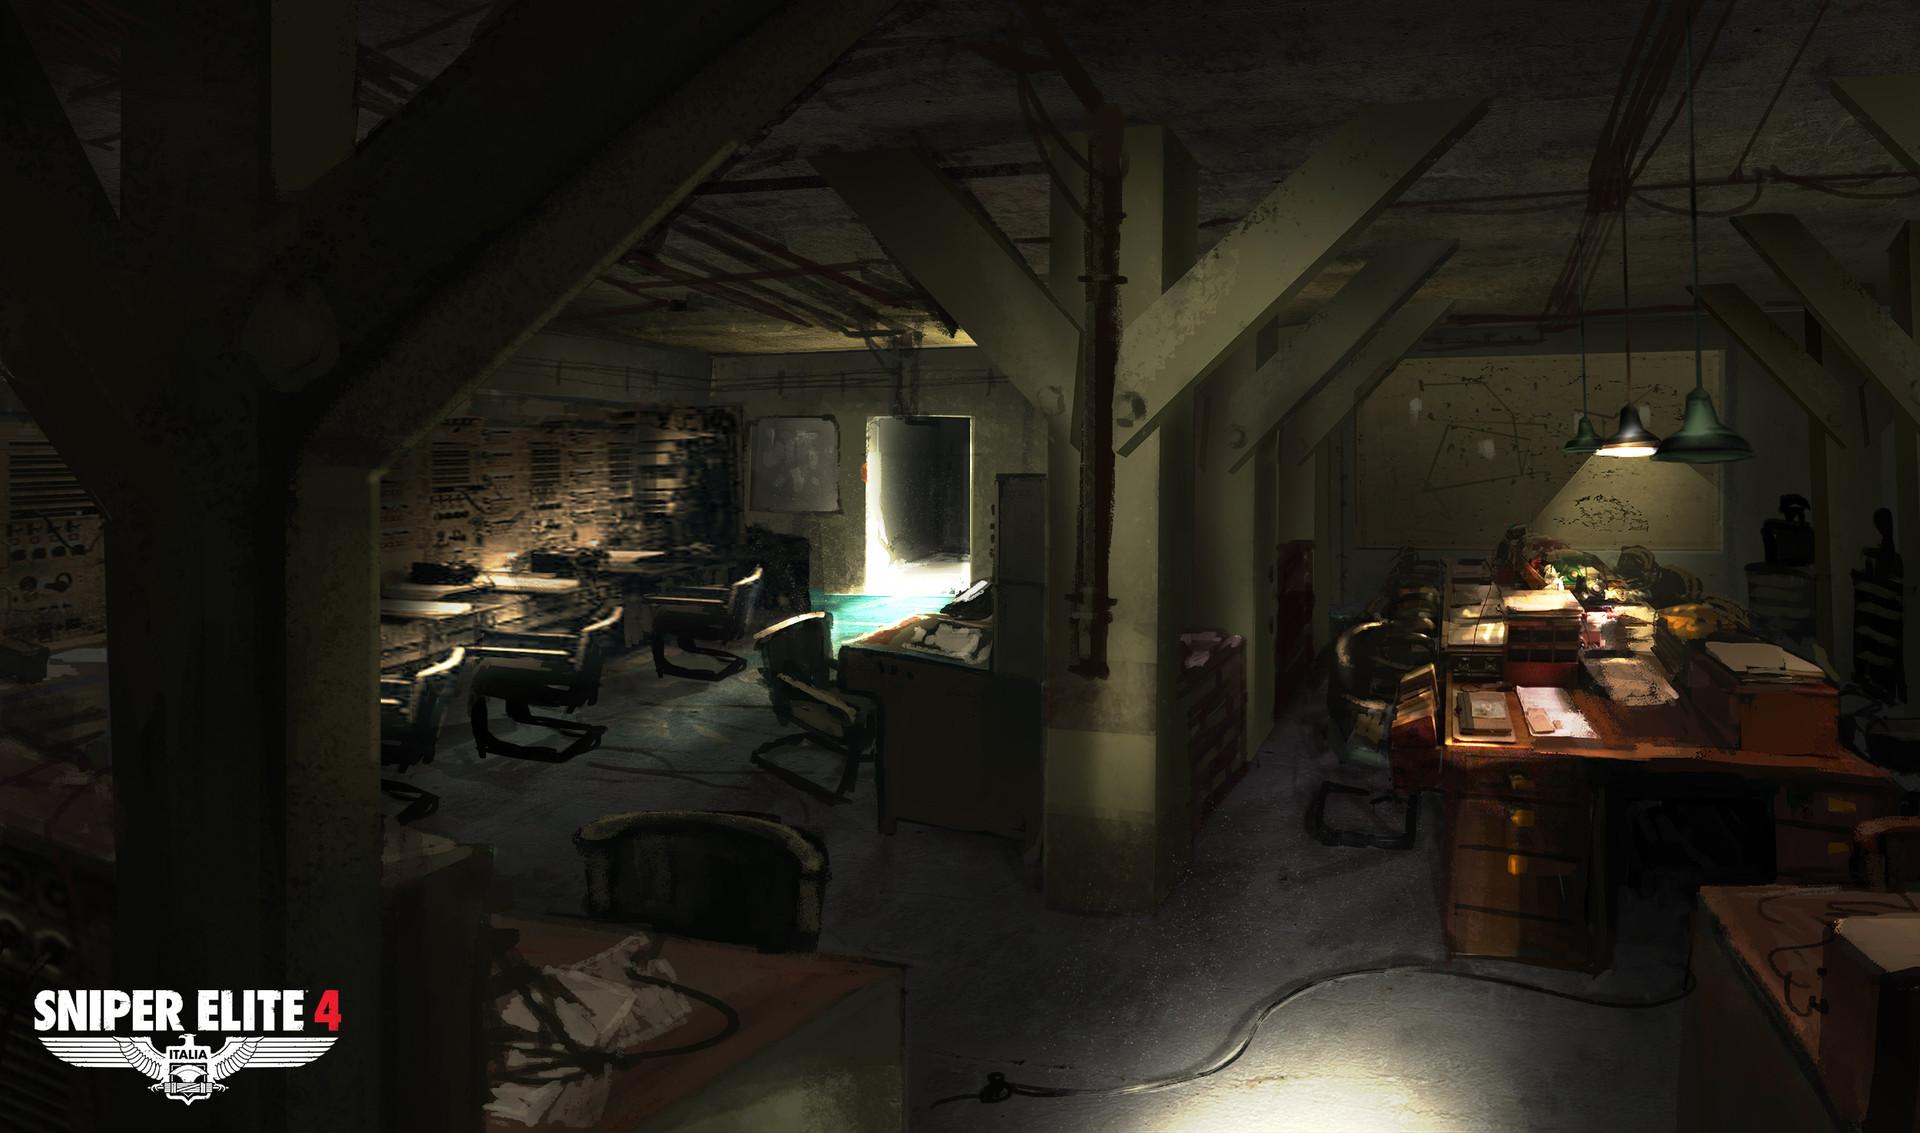 Sniper Elite 4 Art by Jack Eaves